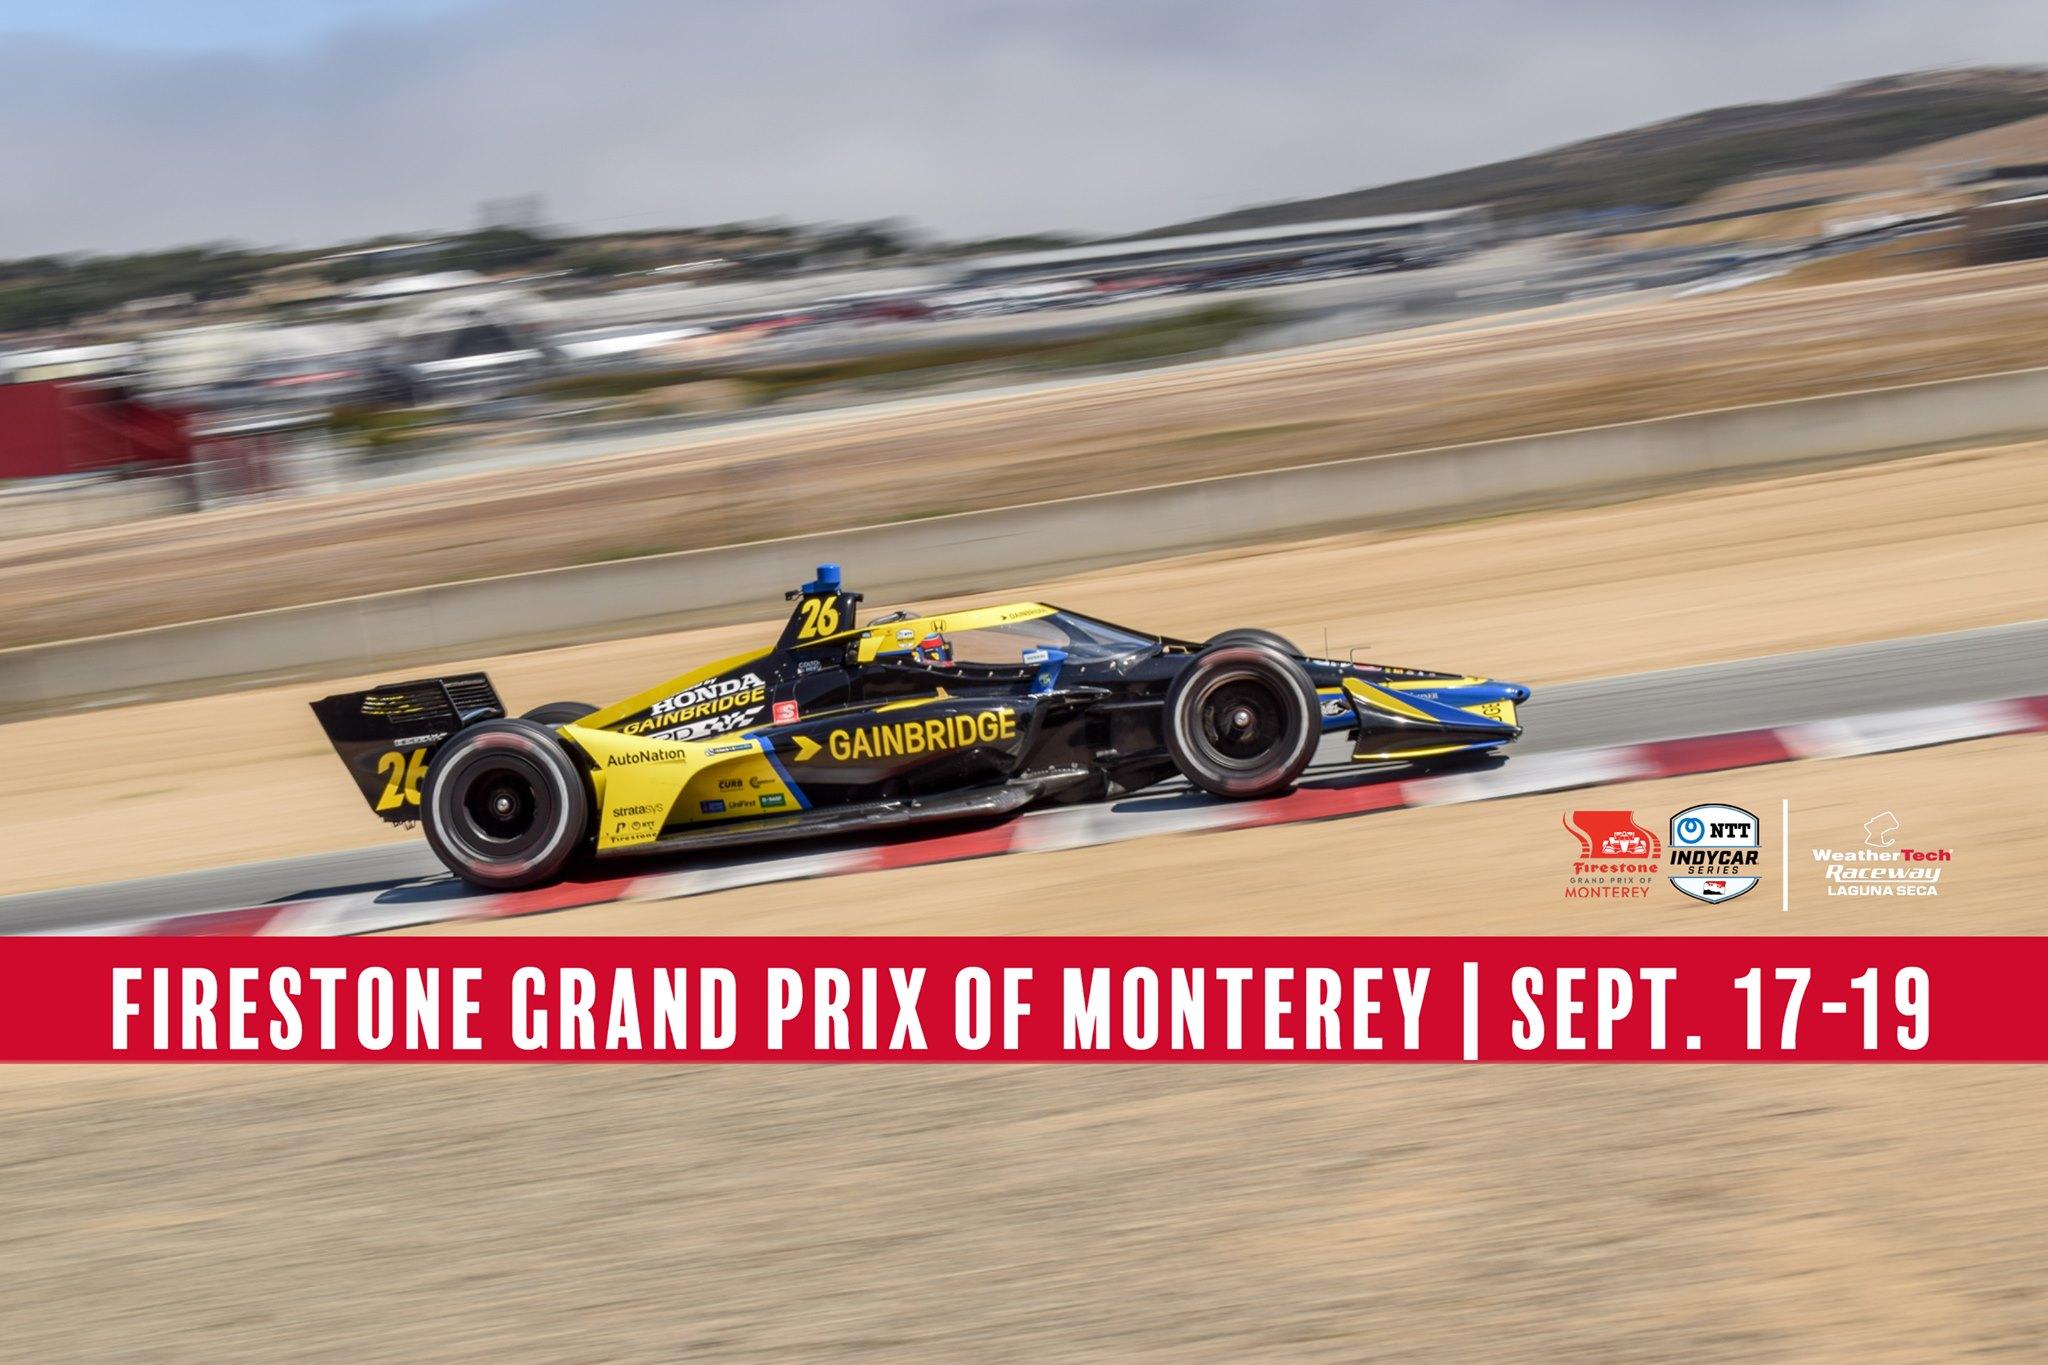 Firestone Grand Prix of Monterey